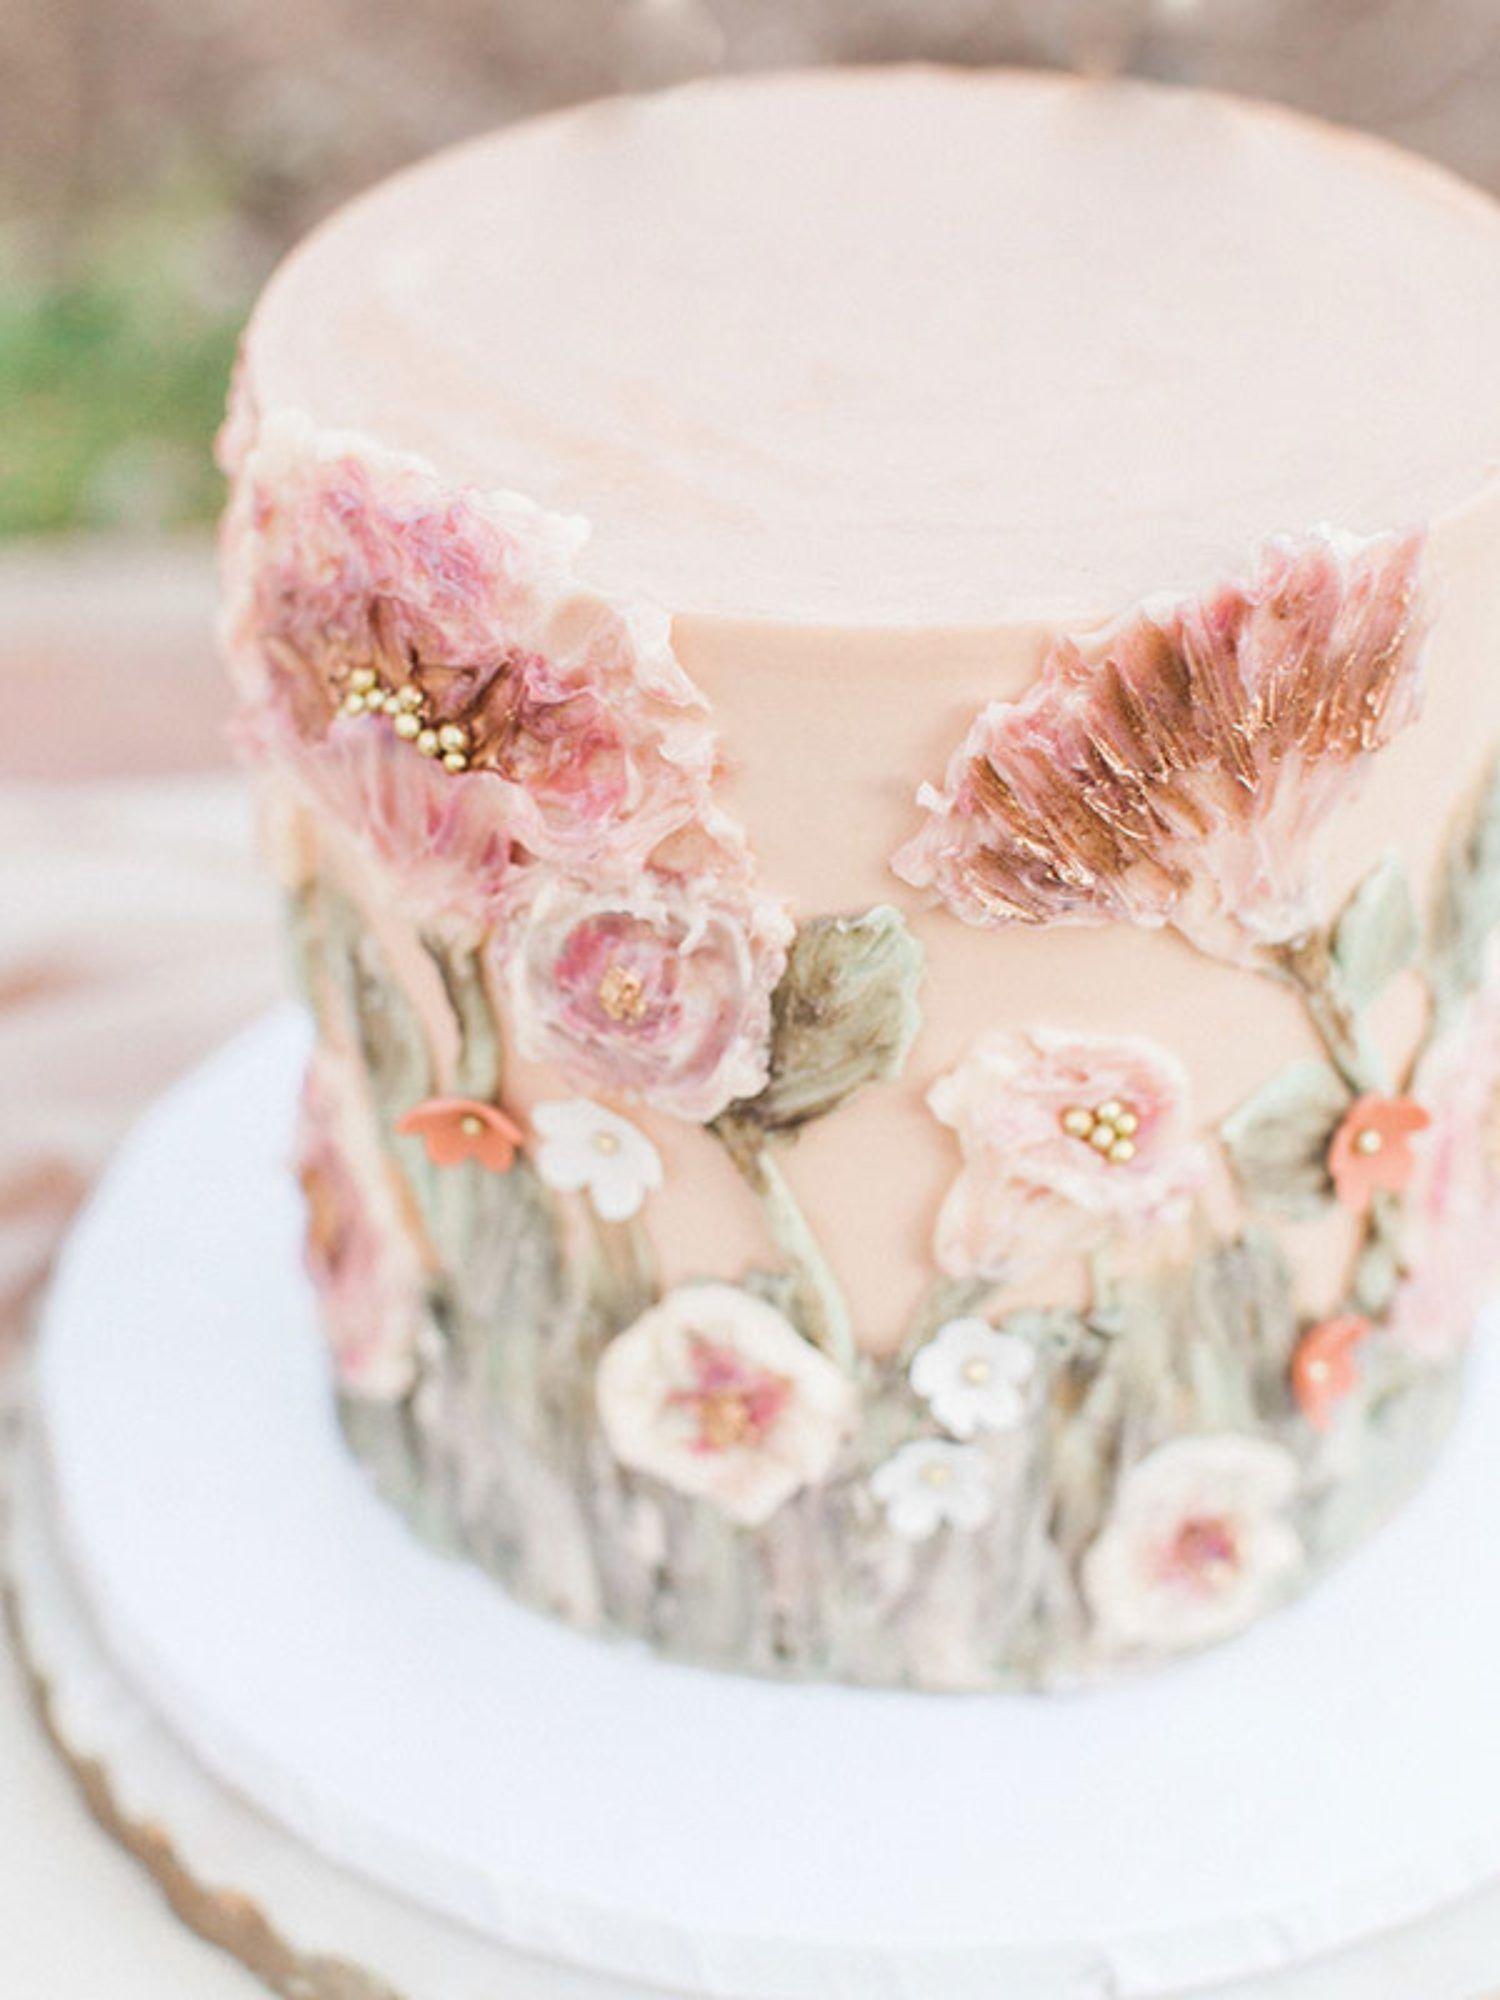 Fabulous floral wedding cake for spring weddingcakes cake art in